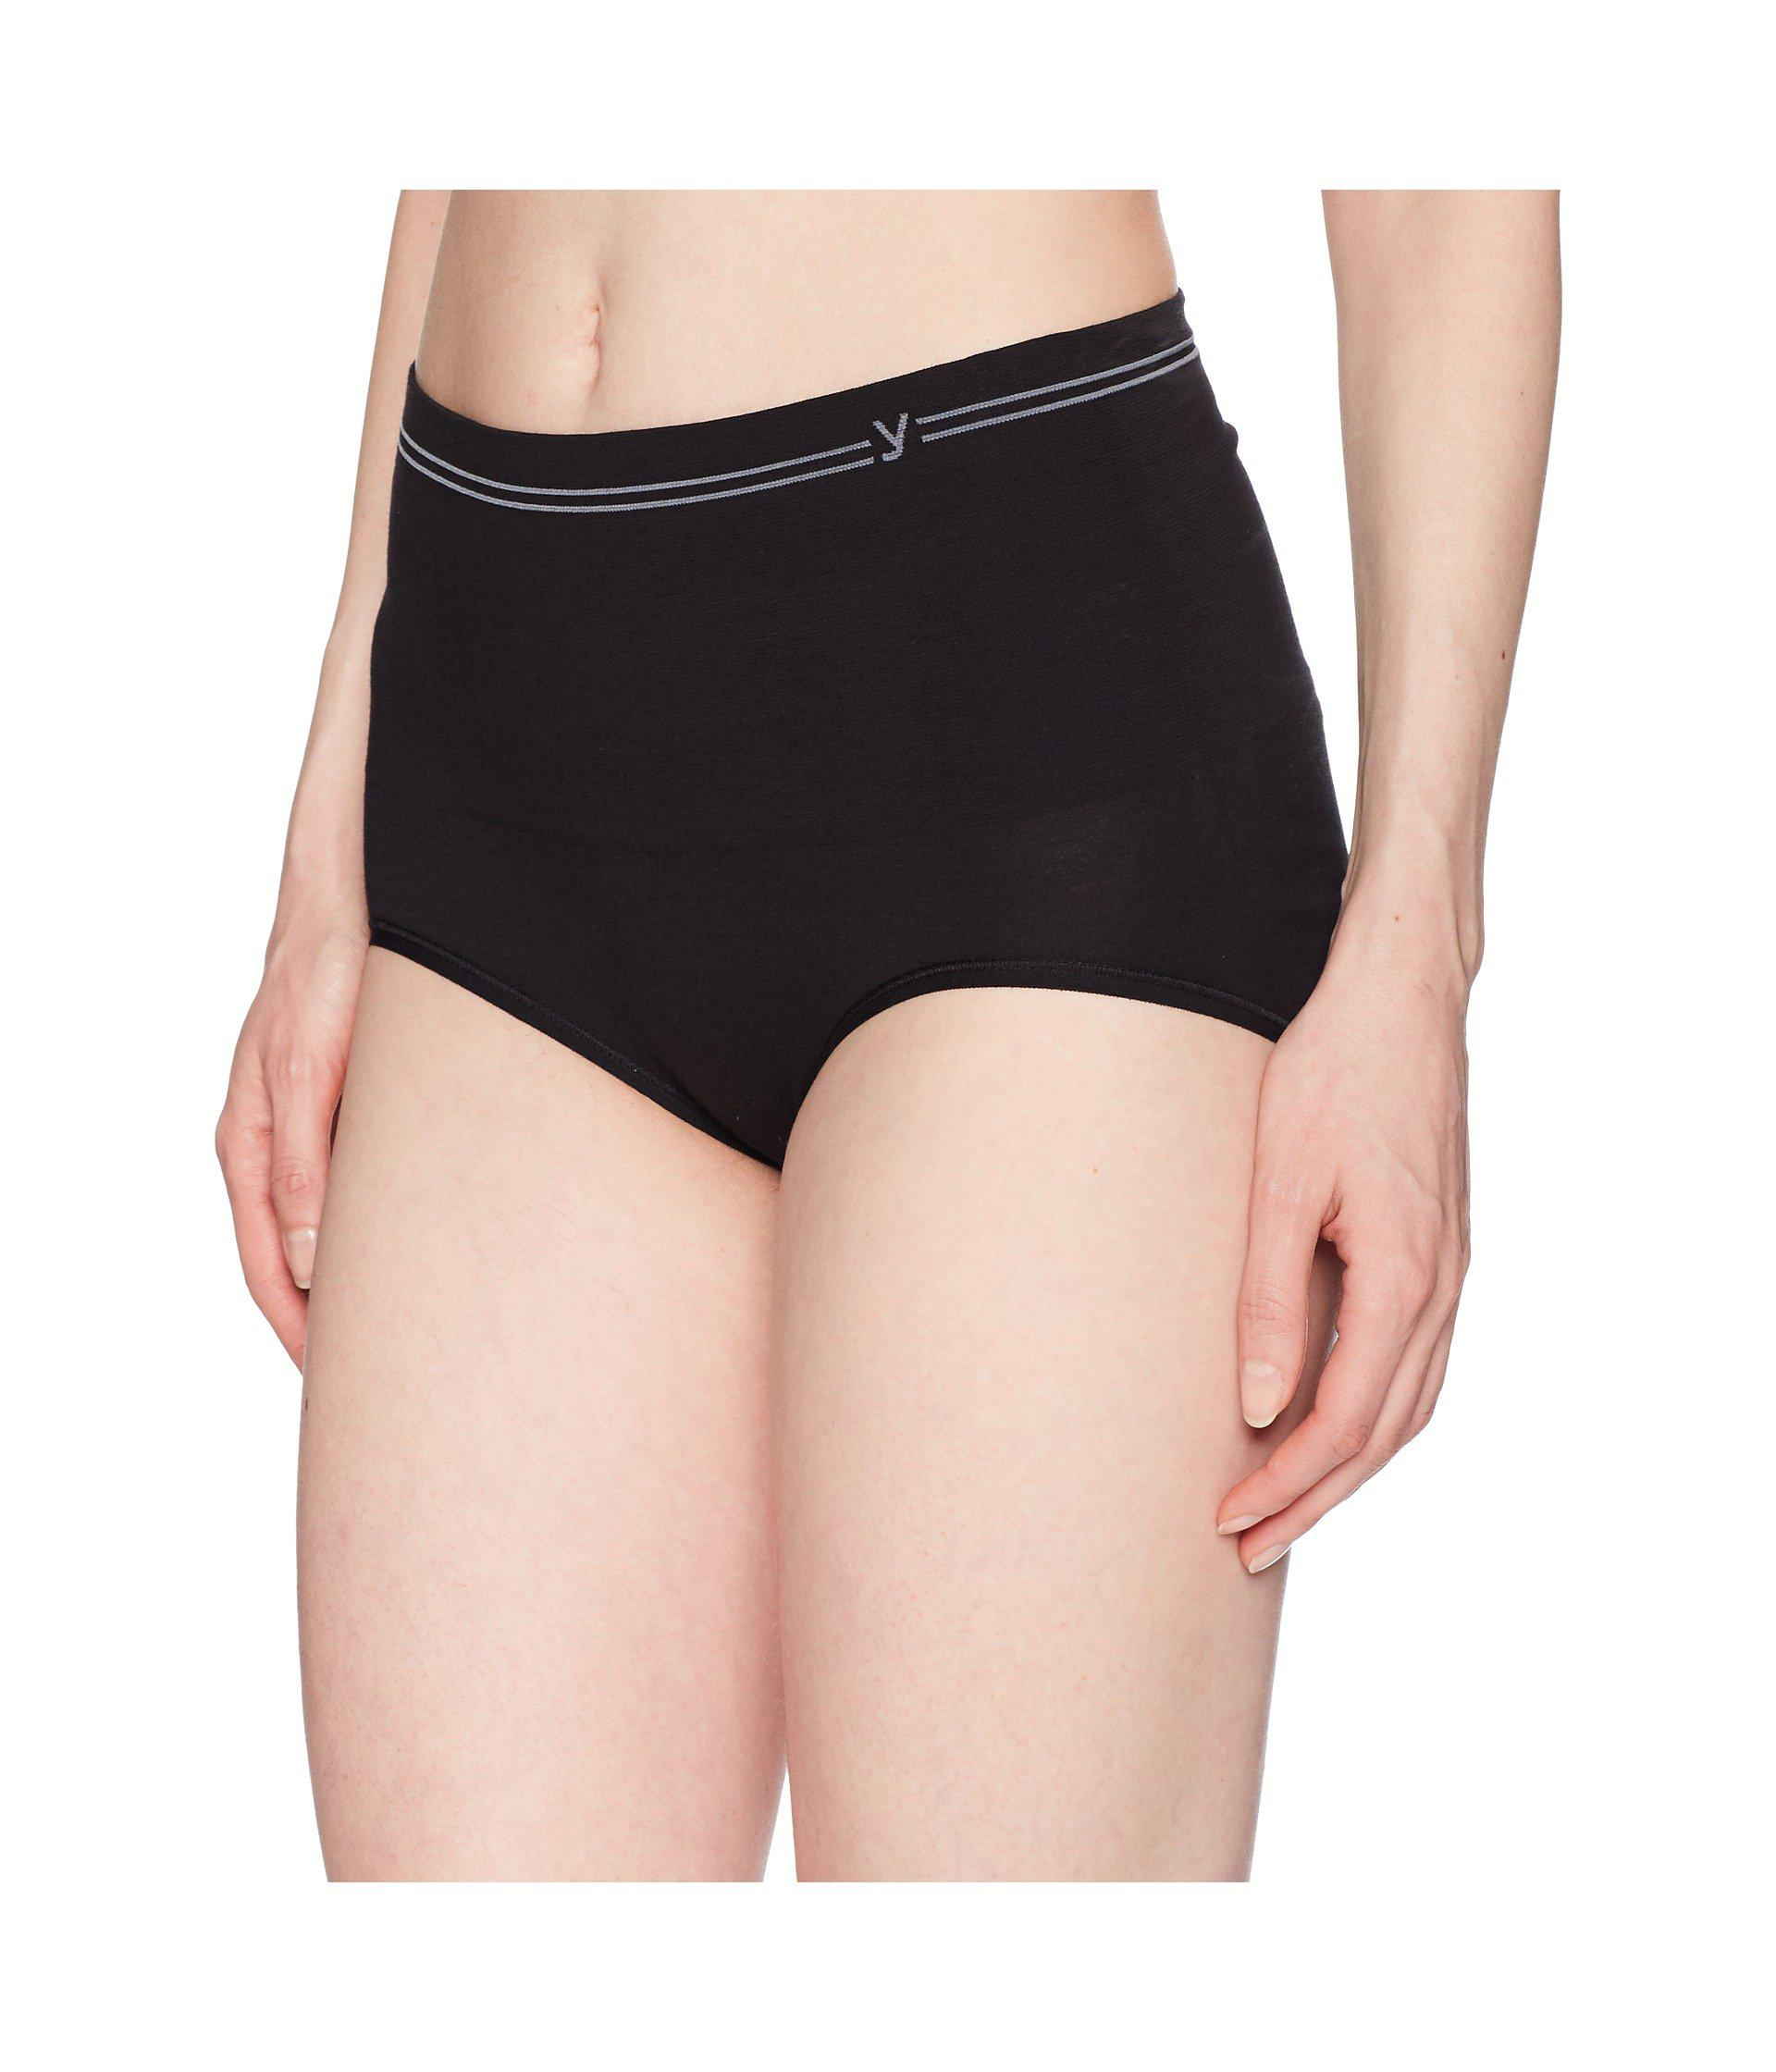 d6cc16c5d863 Lyst - Yummie Cotton Seamless Shaping Brief (white) Women's Underwear in  Black